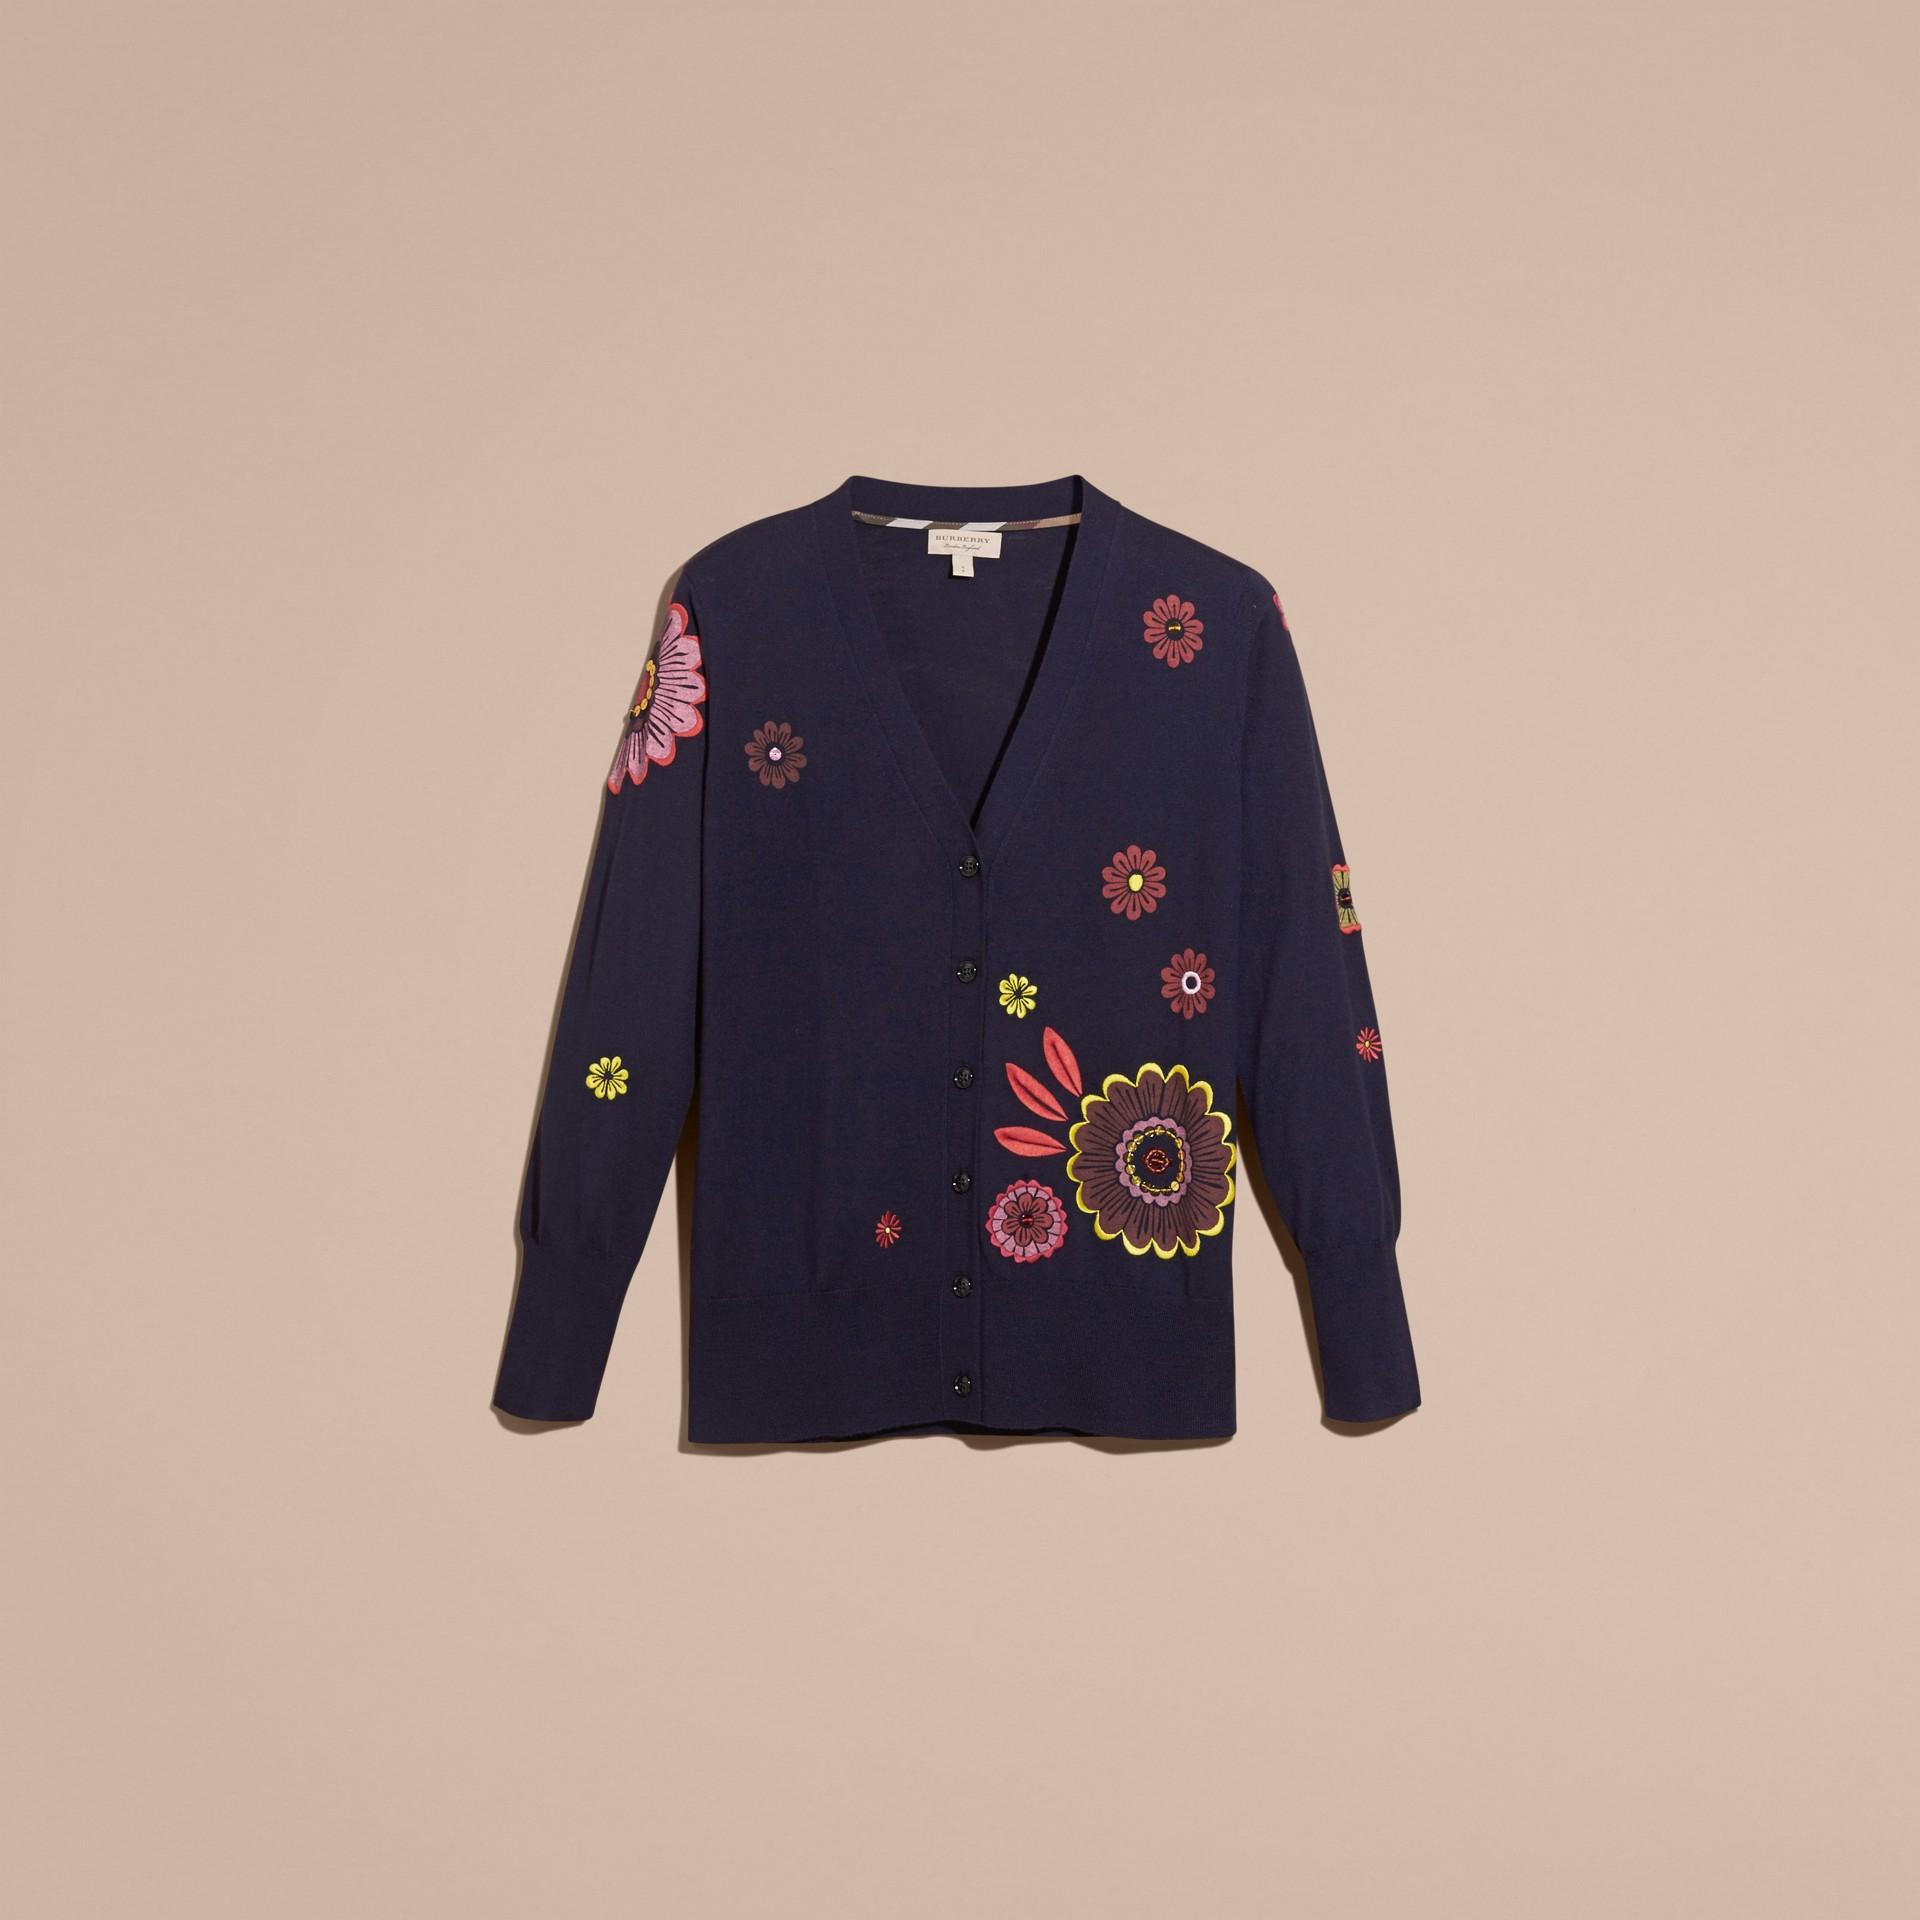 Navy Floral-embellished Merino Wool Cardigan - gallery image 4